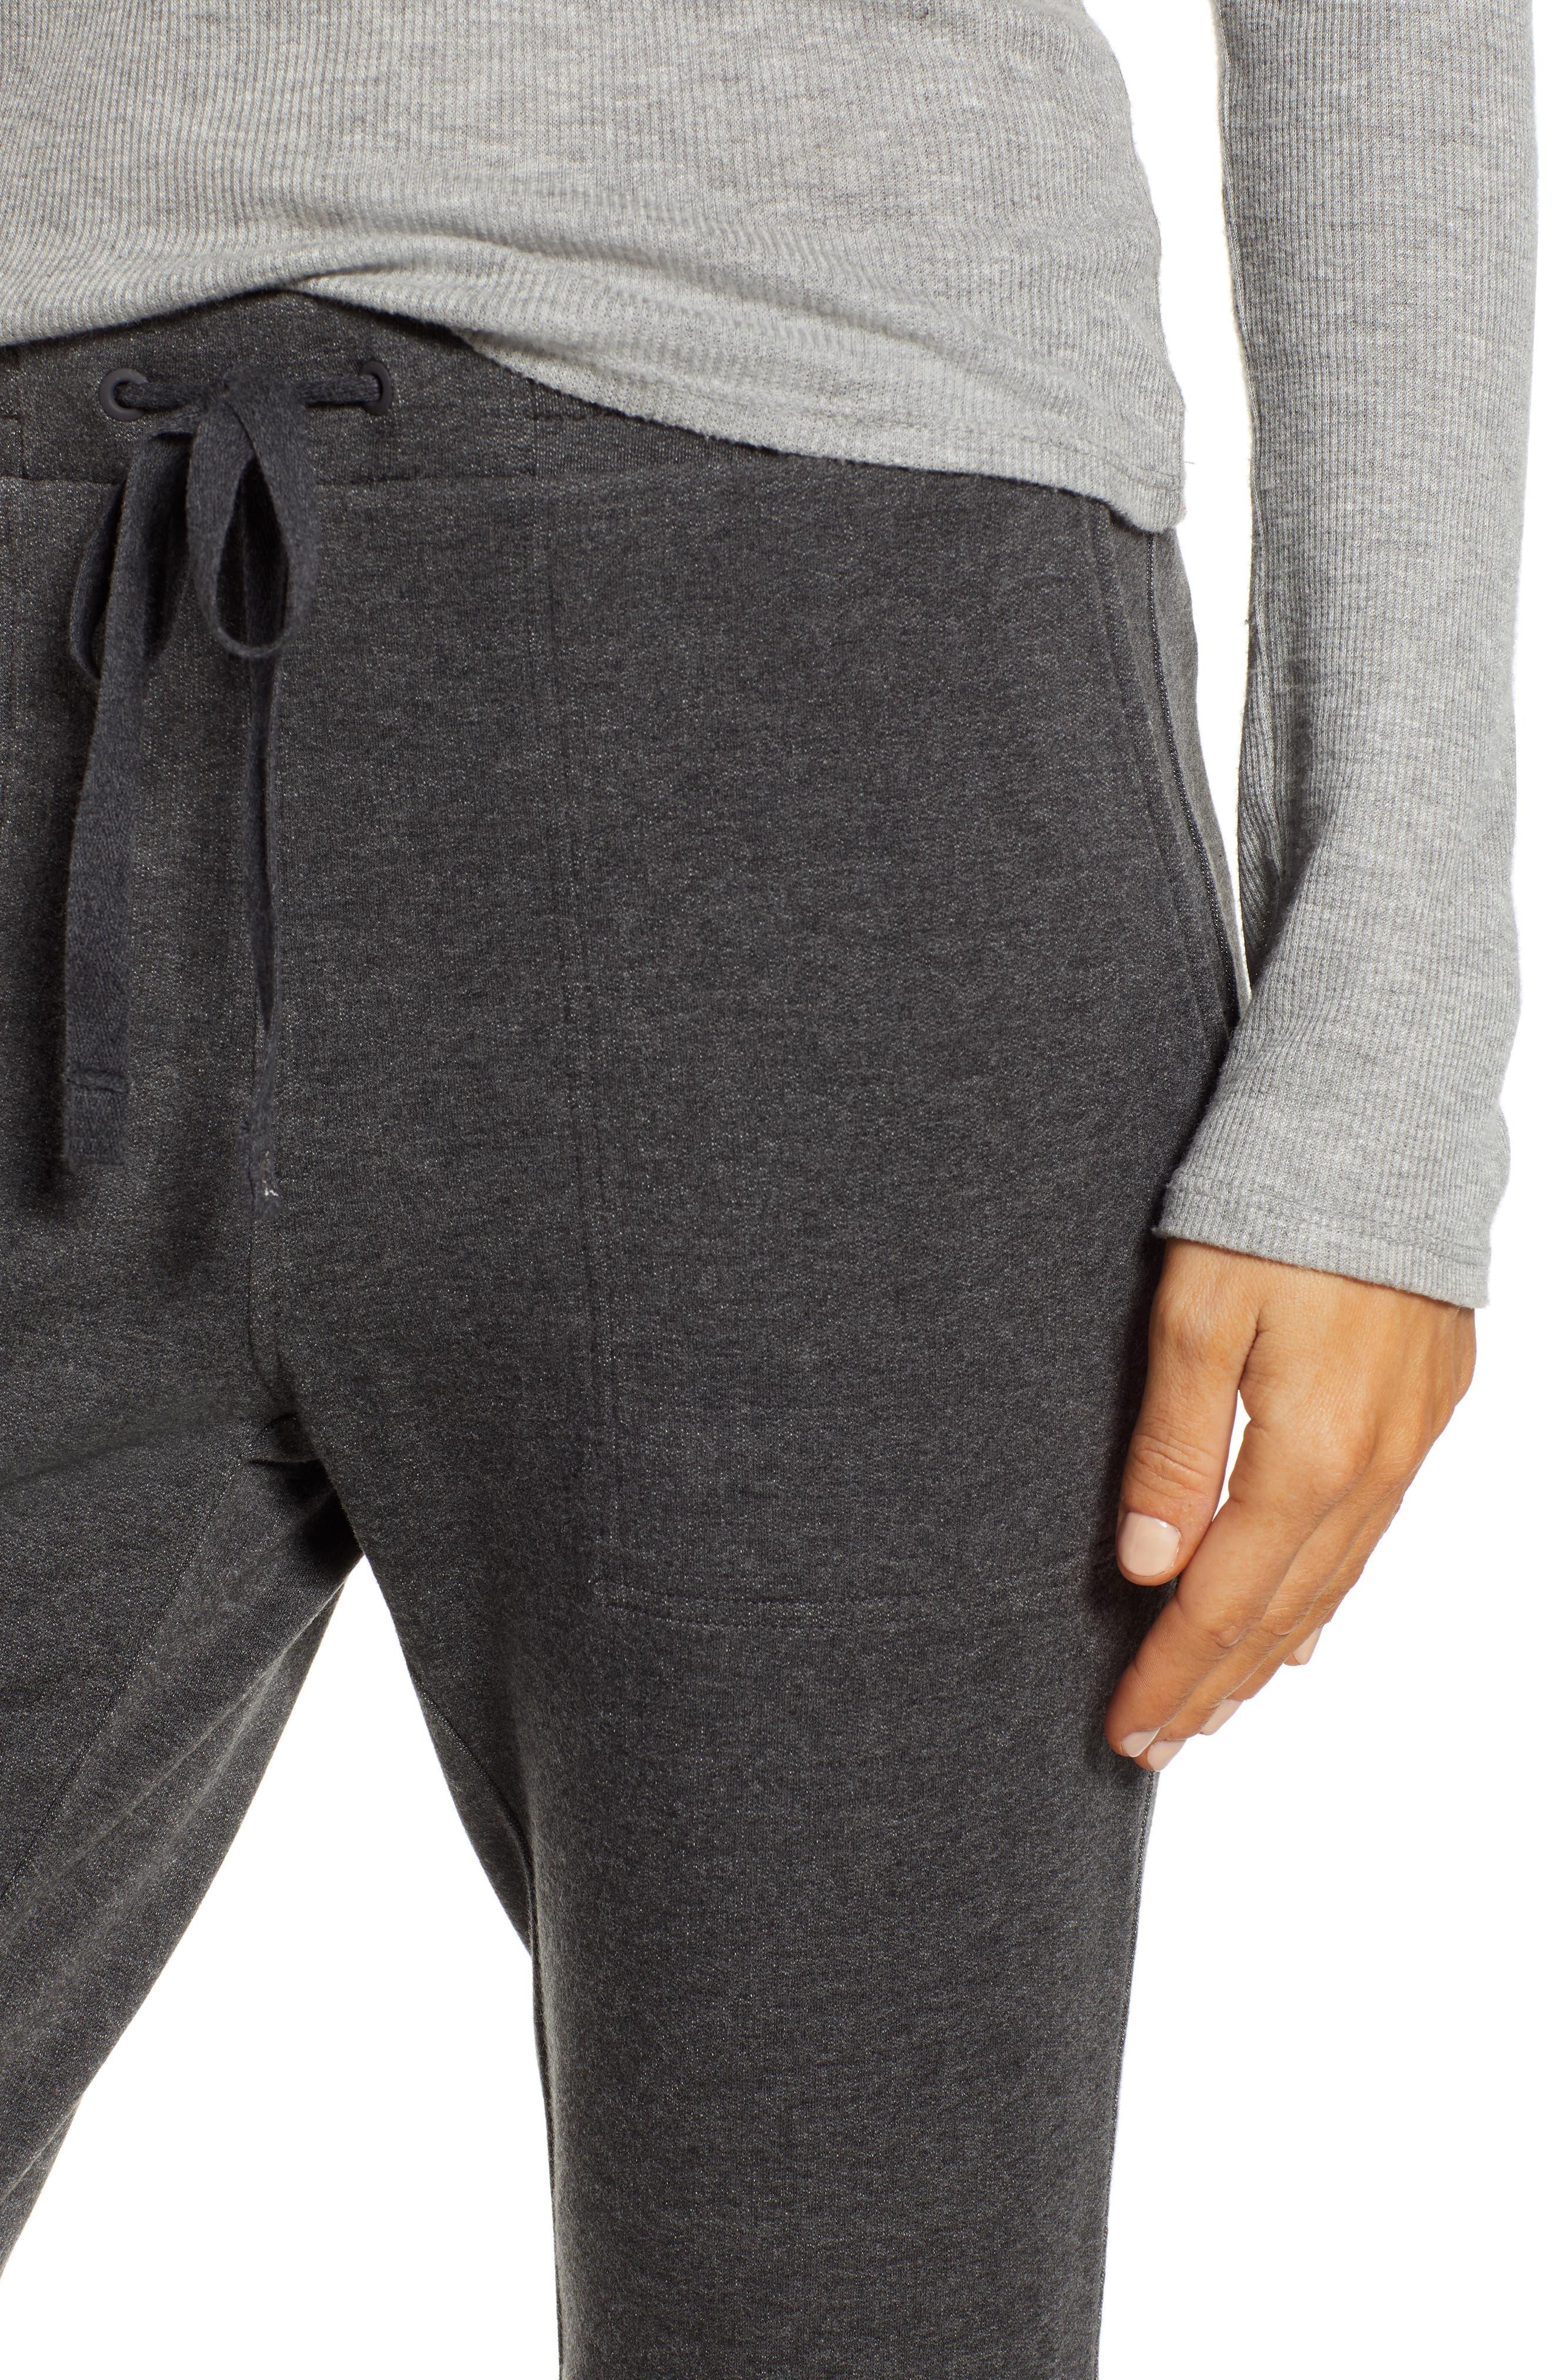 Zen Bounce Upstate Sweatpants,                             Alternate thumbnail 4, color,                             CHARCOAL